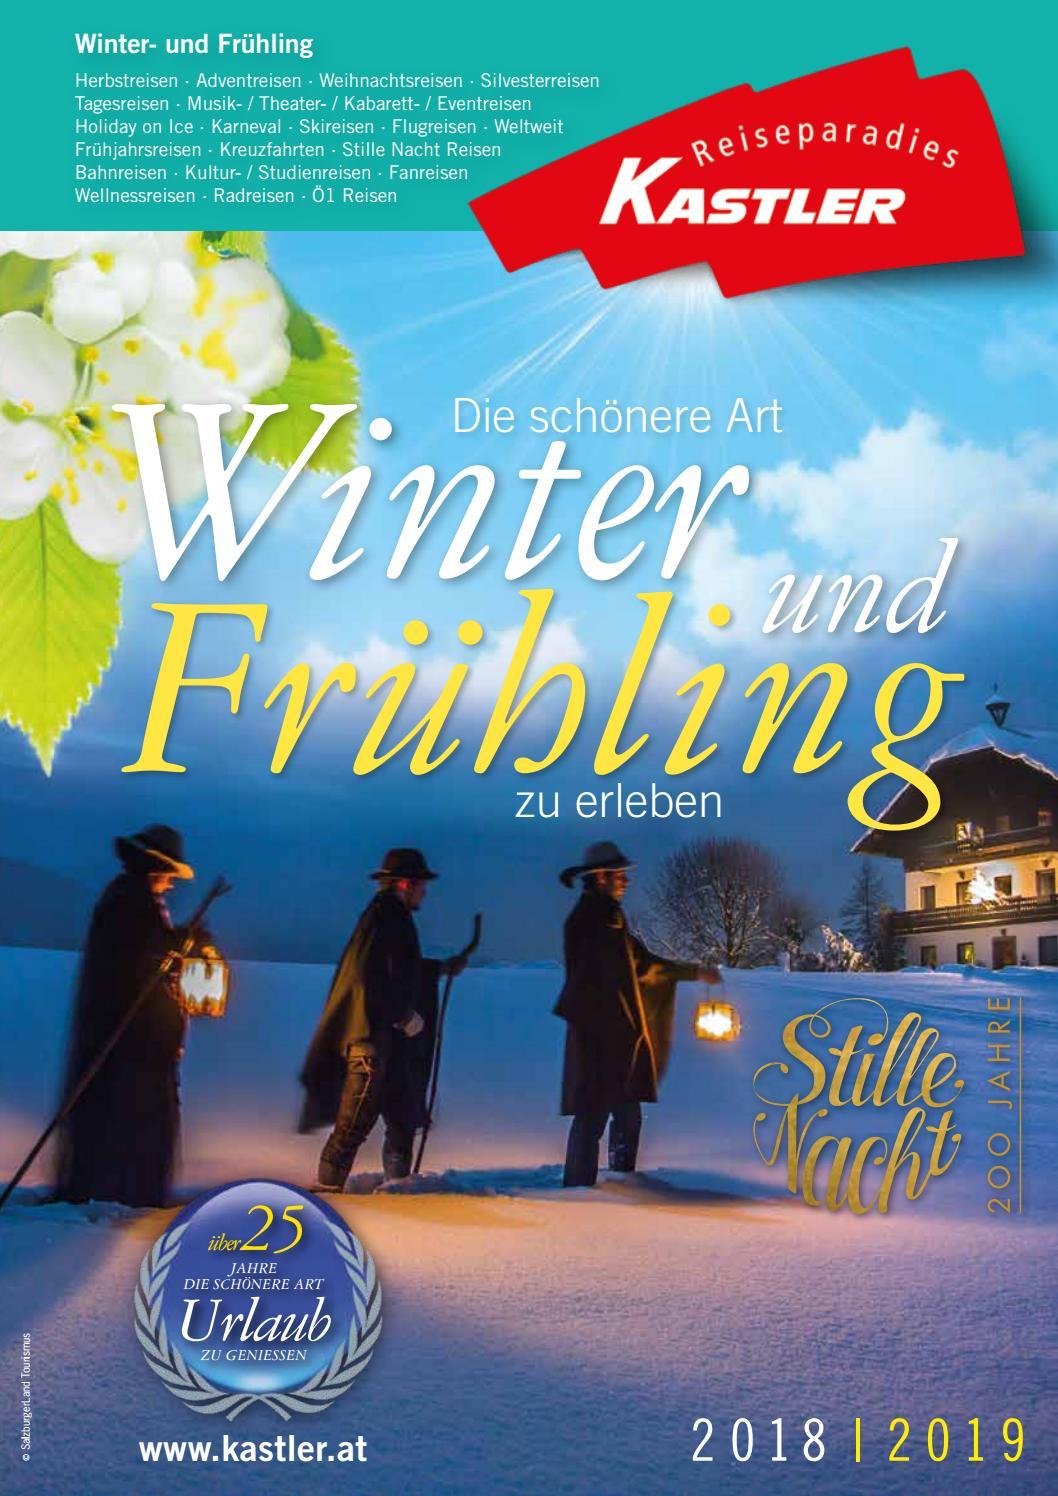 Katalog Winter und Frühling 2018 /2019 by Reiseparadies Kastler - issuu